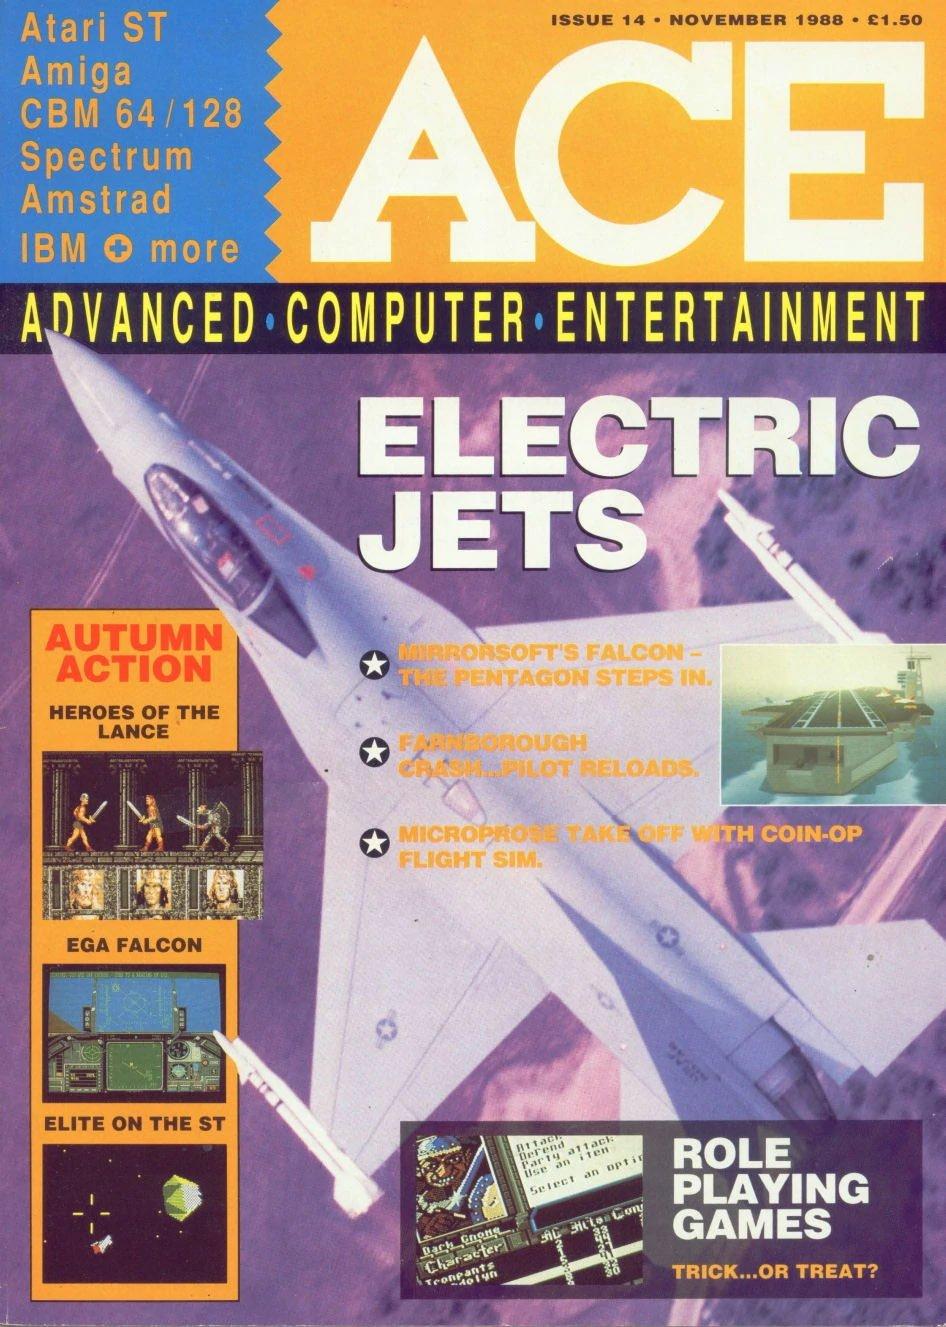 ACE 14 (November 1988)